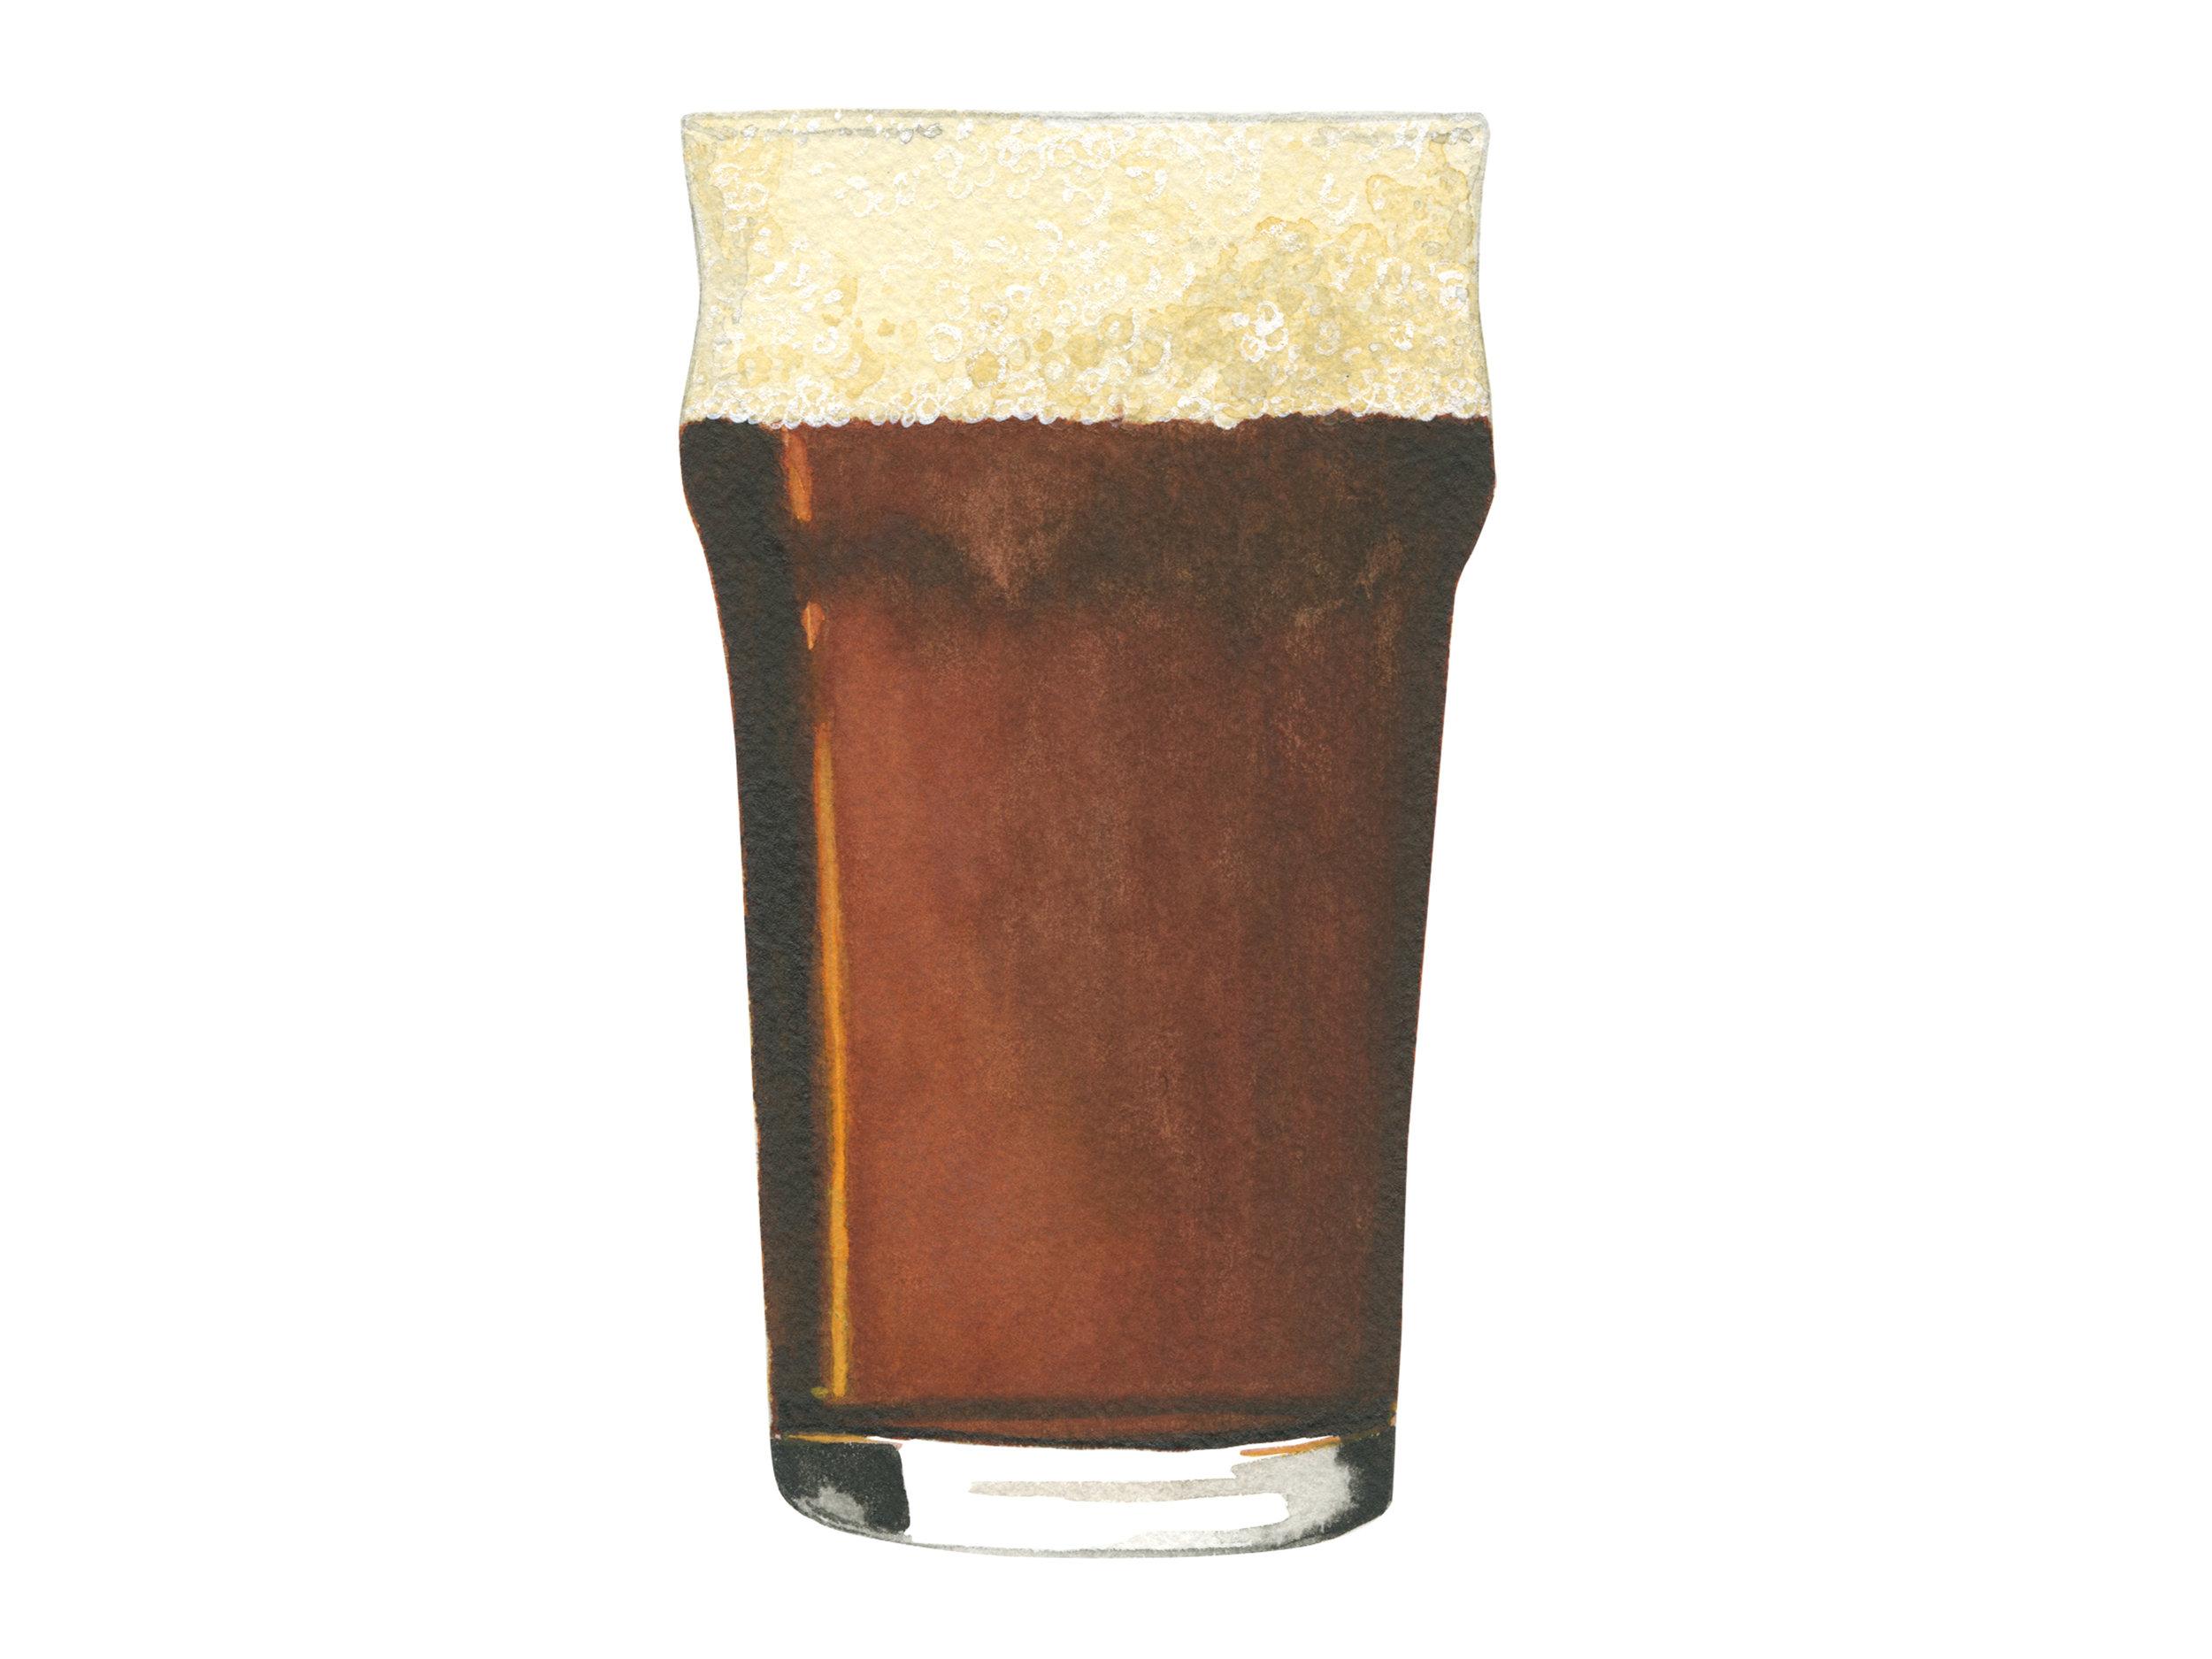 Irish Red | Craft Beer Series